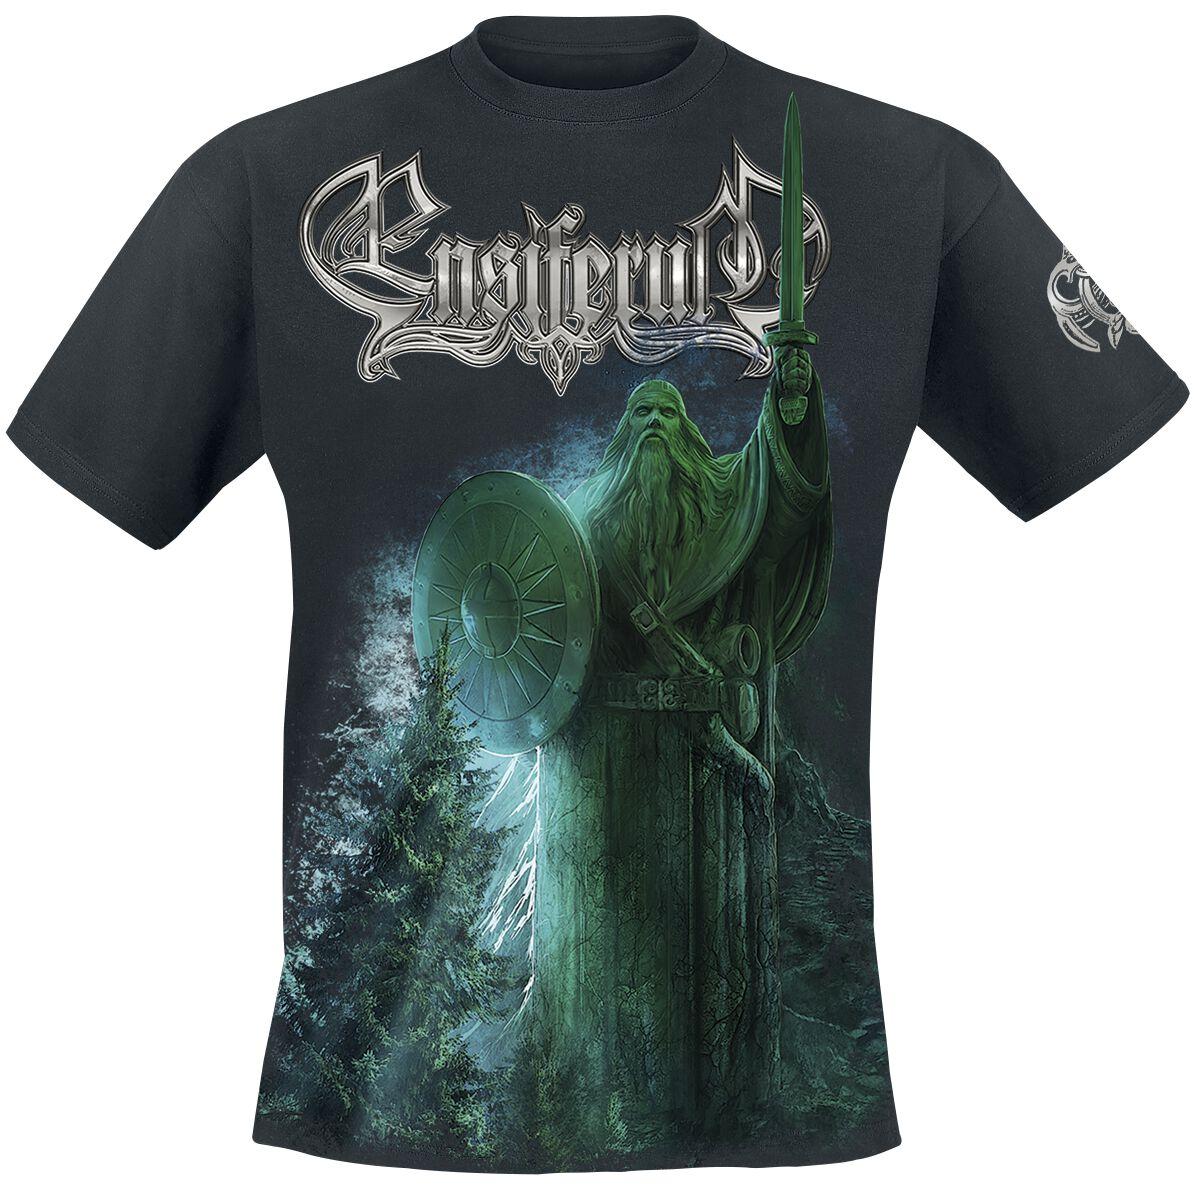 Zespoły - Koszulki - T-Shirt Ensiferum Two paths T-Shirt czarny - 375879